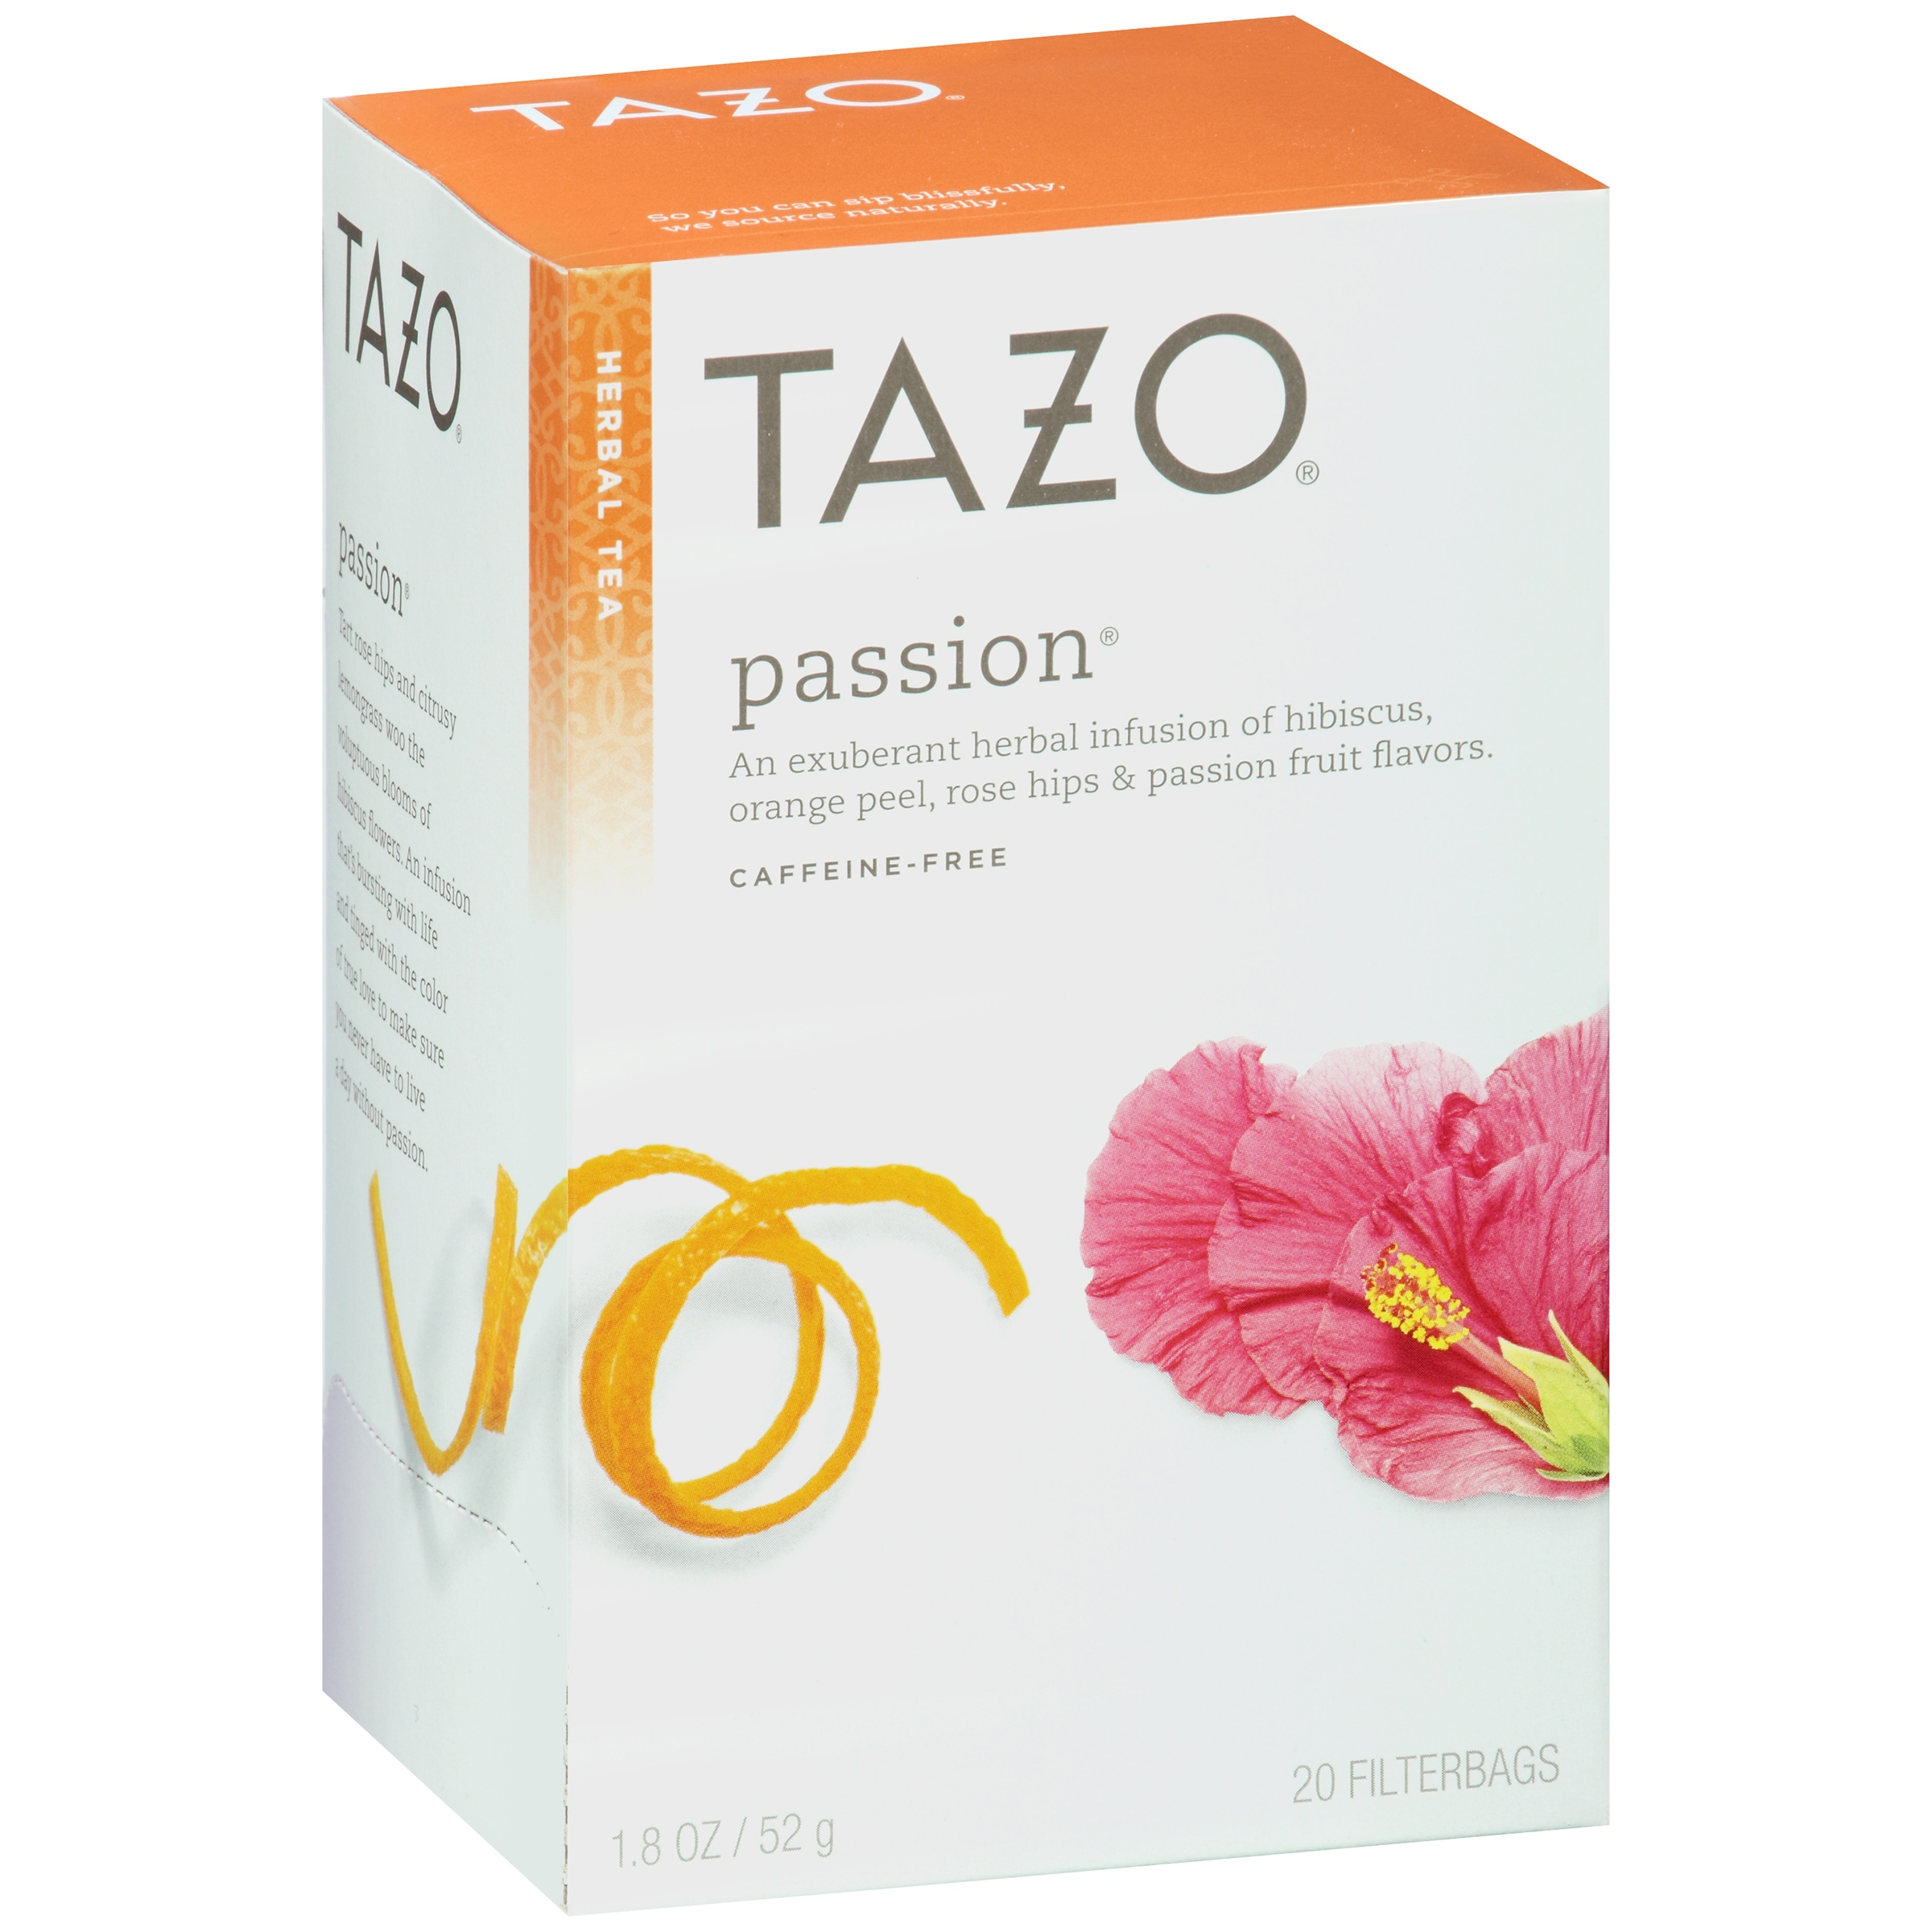 Tazo Passion Herbal Infusion Caffeine Free Tea Bags, 20 ct